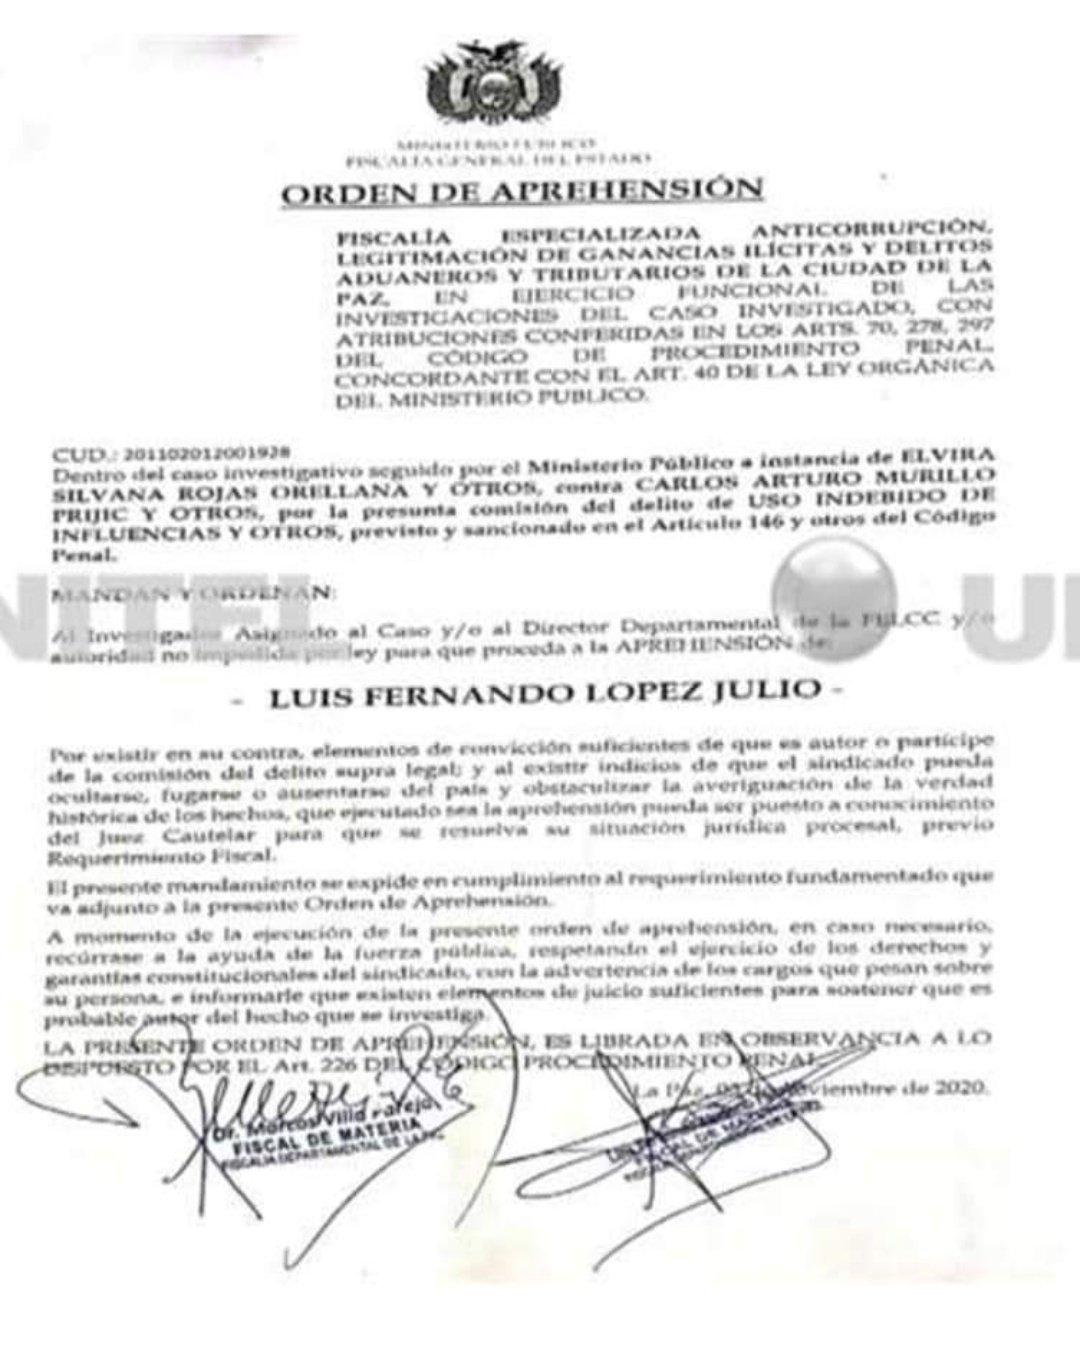 2019 Bolivian political crisis - Page 4 Em_Tk9MWMAIpYZ_?format=jpg&name=large